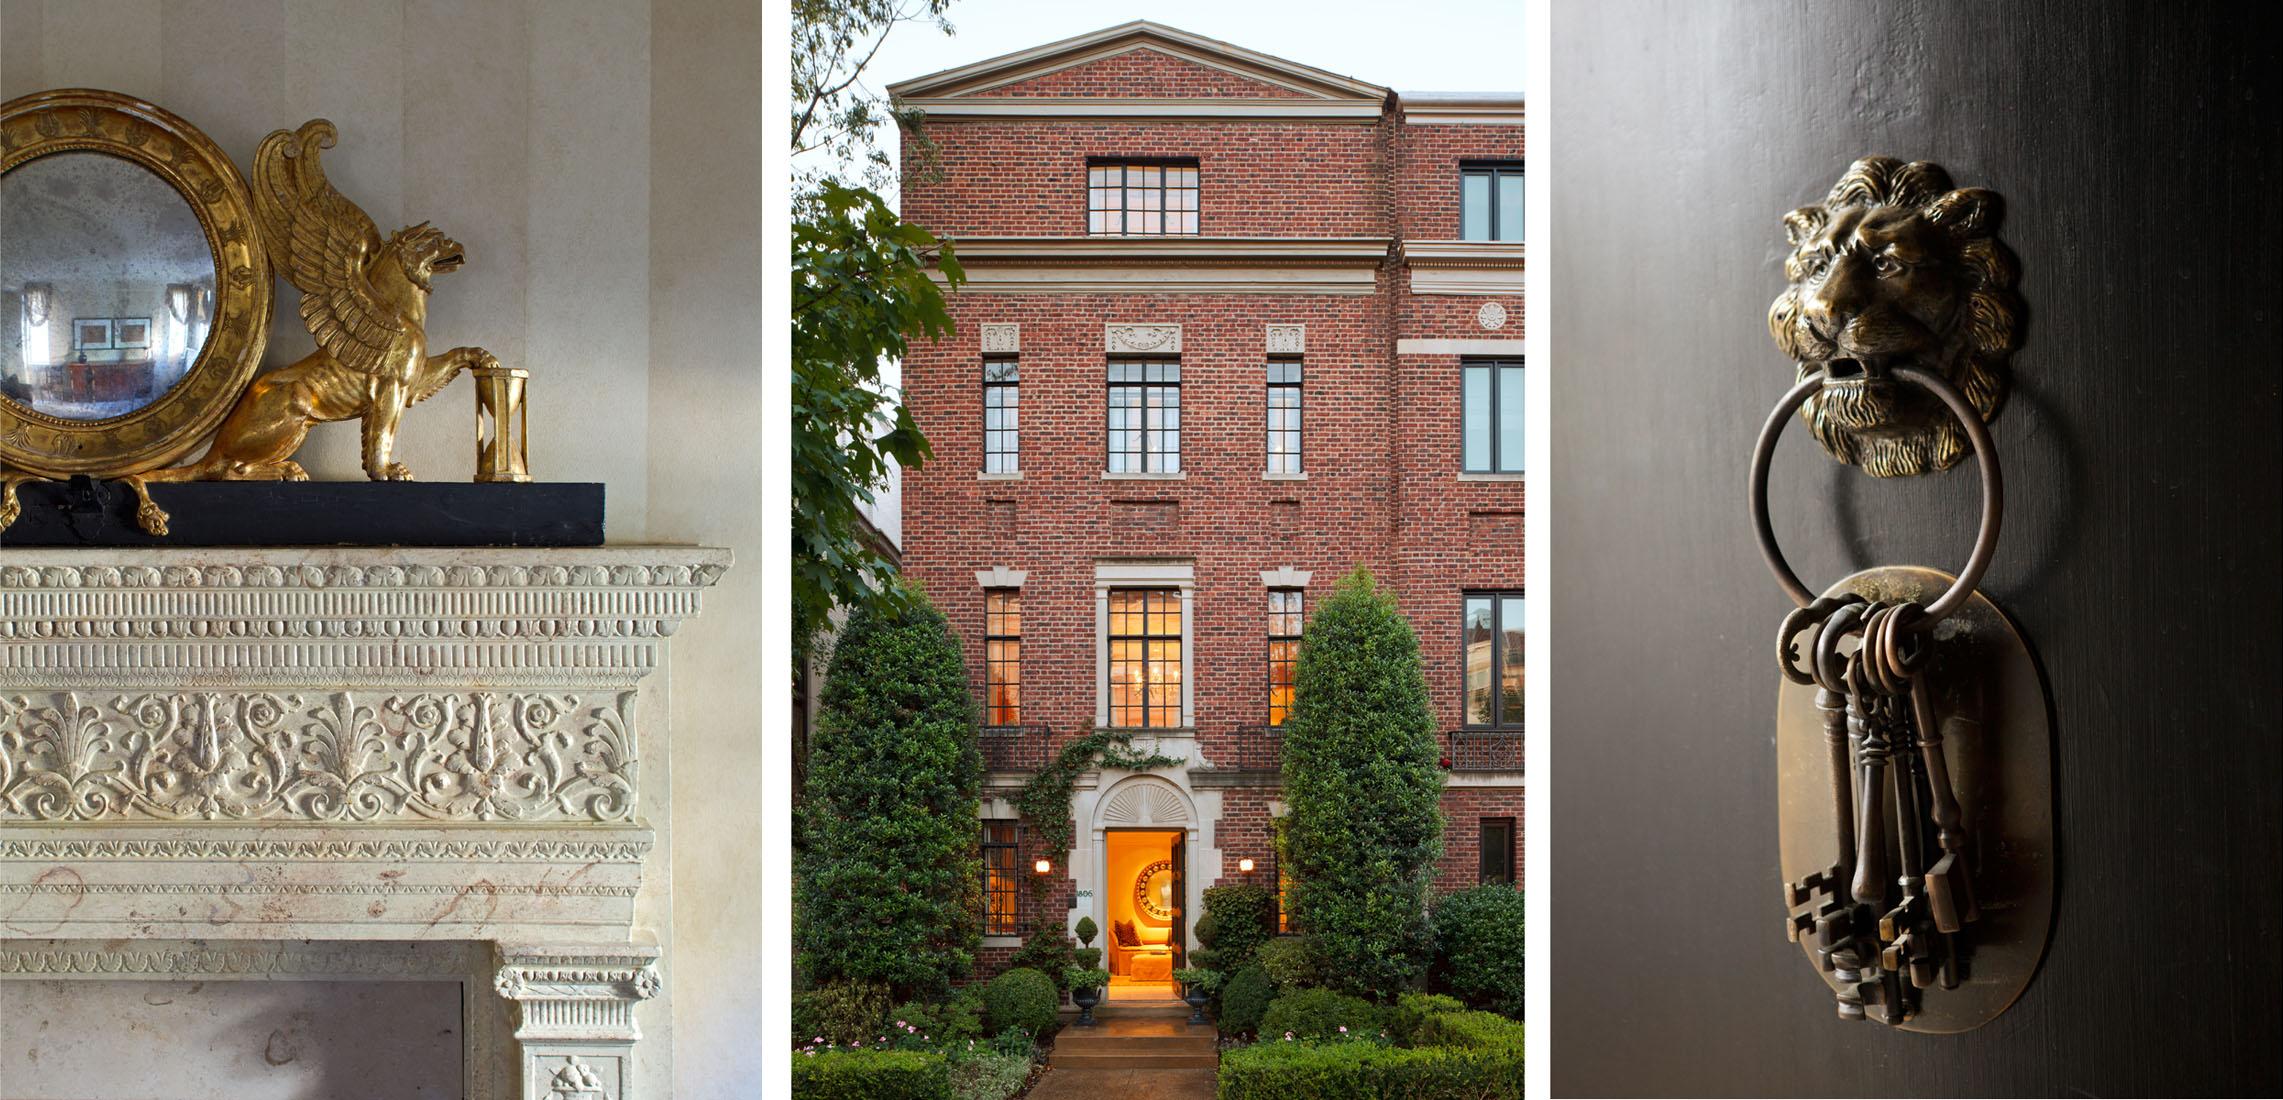 Mary Douglas Drysdale /LUXE Home + DesignEmbassy Row ResidenceWashington, DC